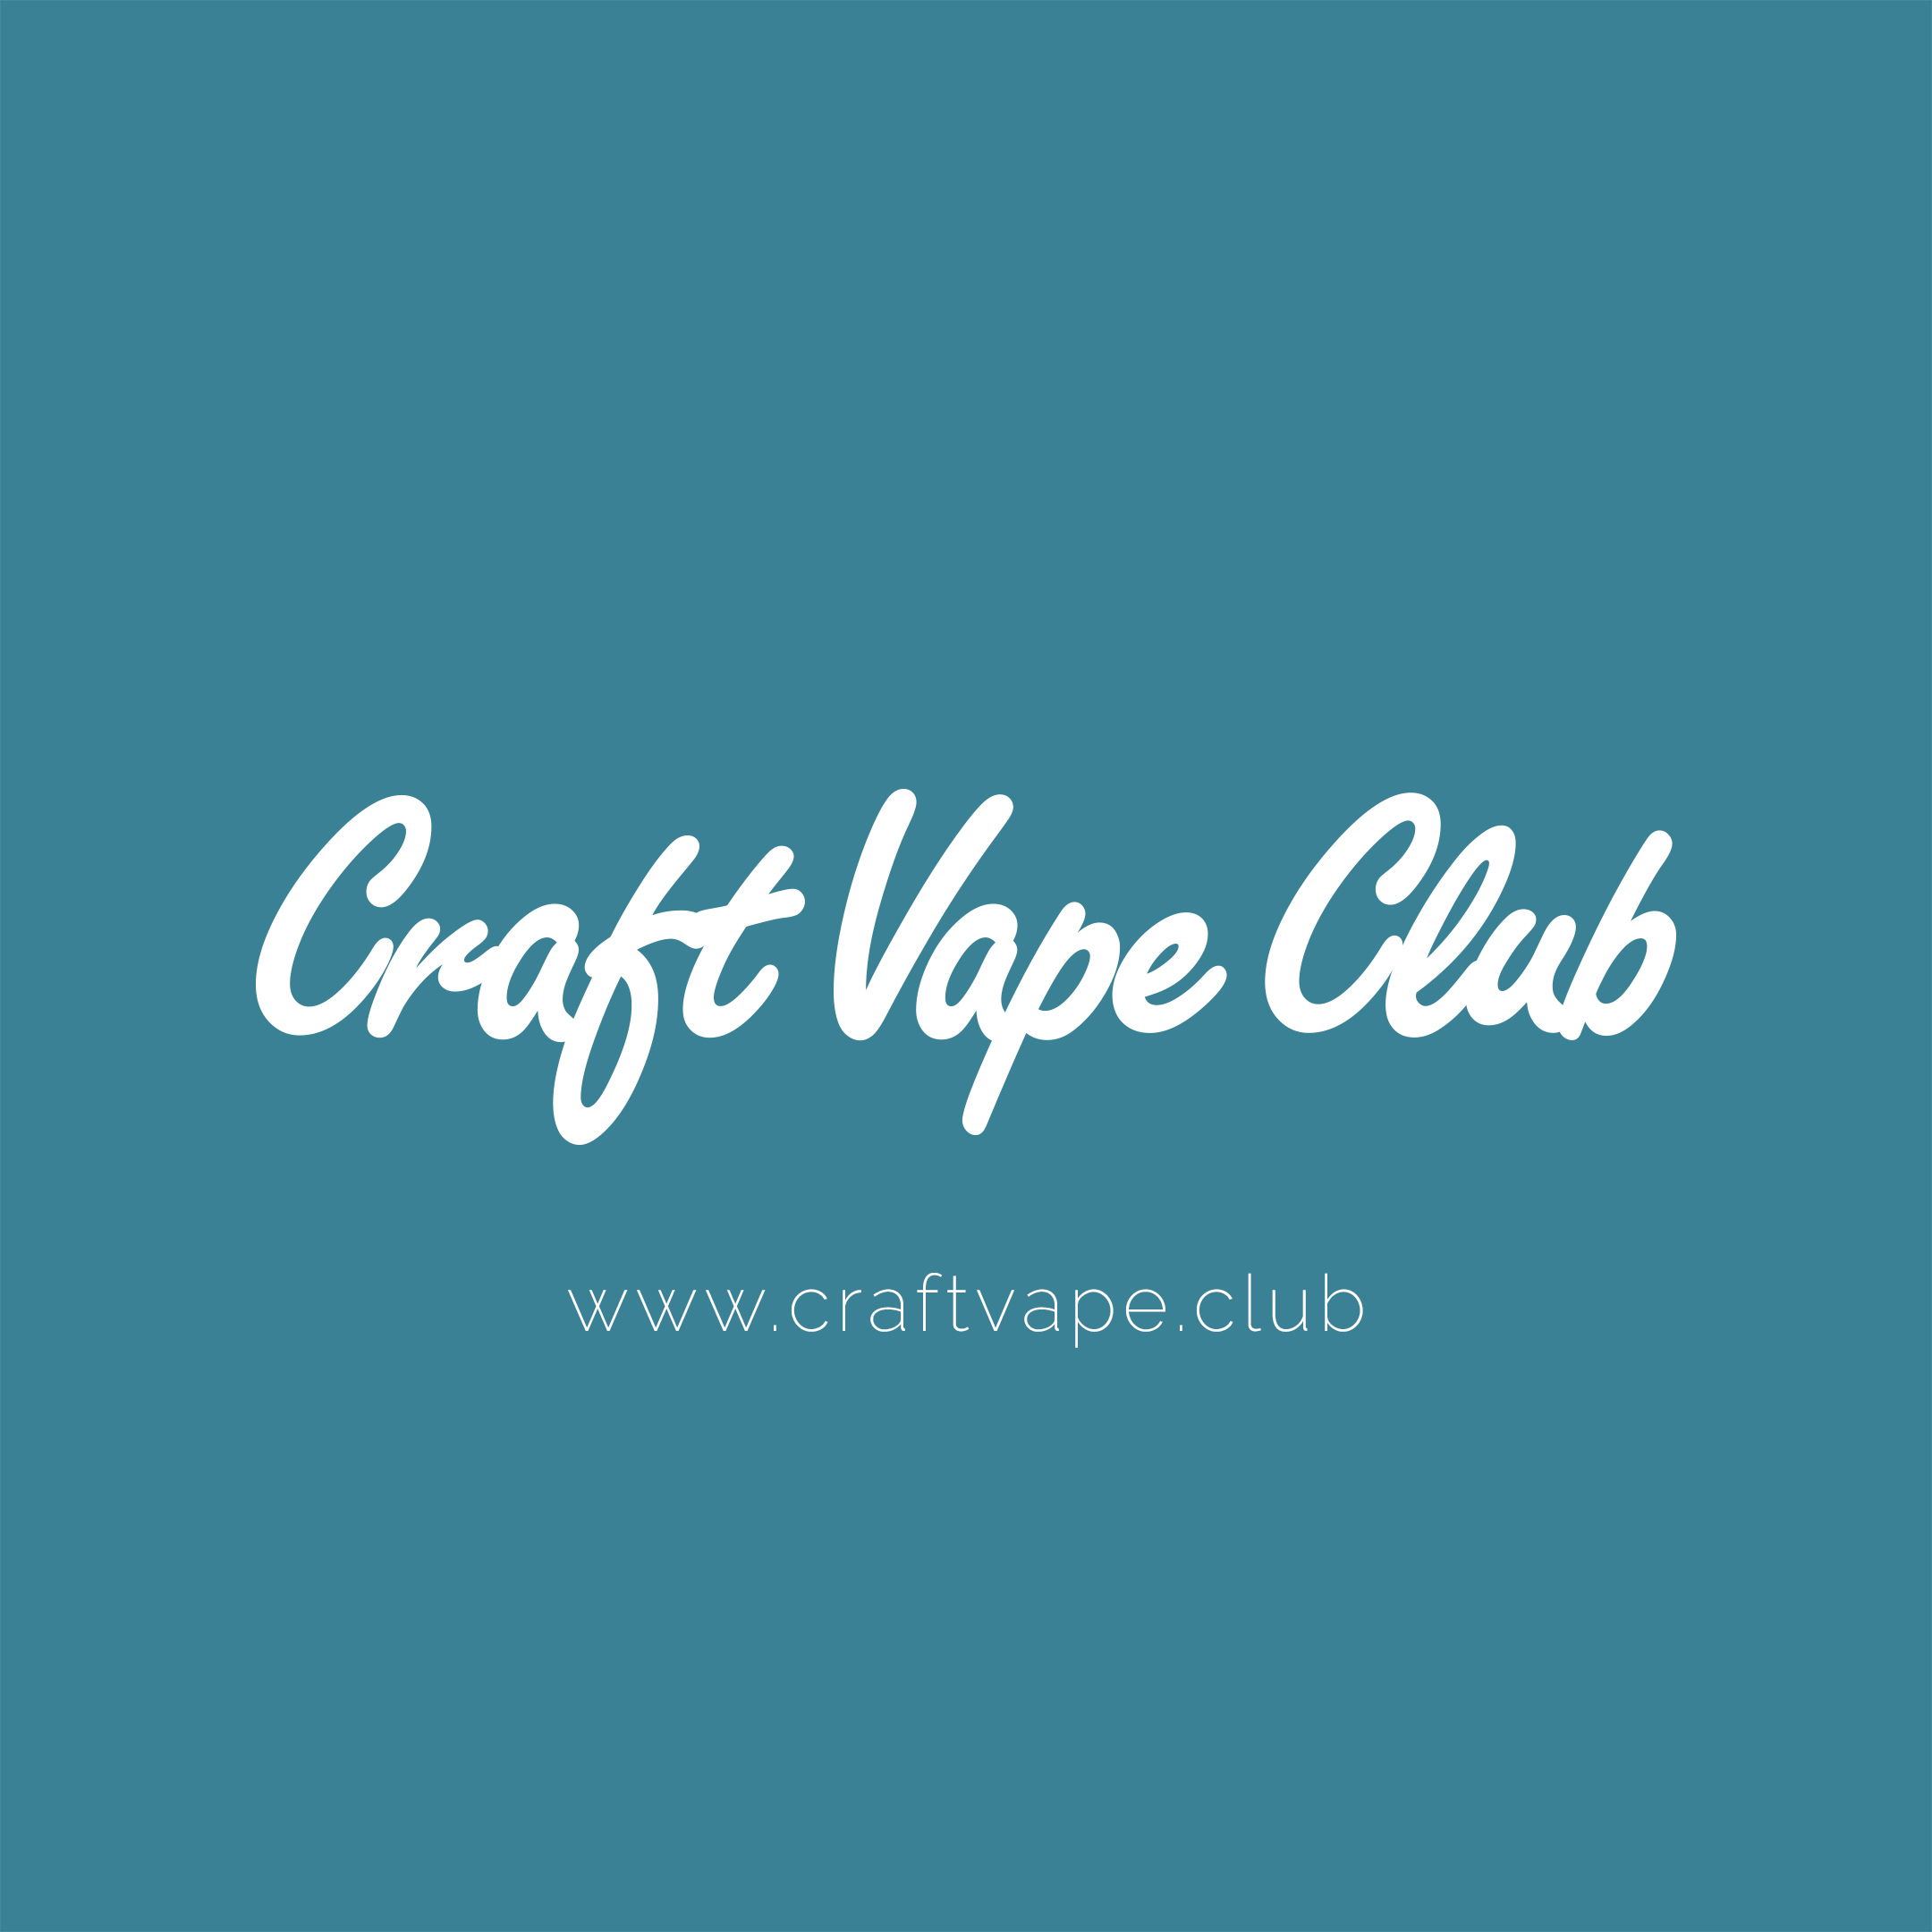 Craft Vape Club Reviews   Read Customer Service Reviews of